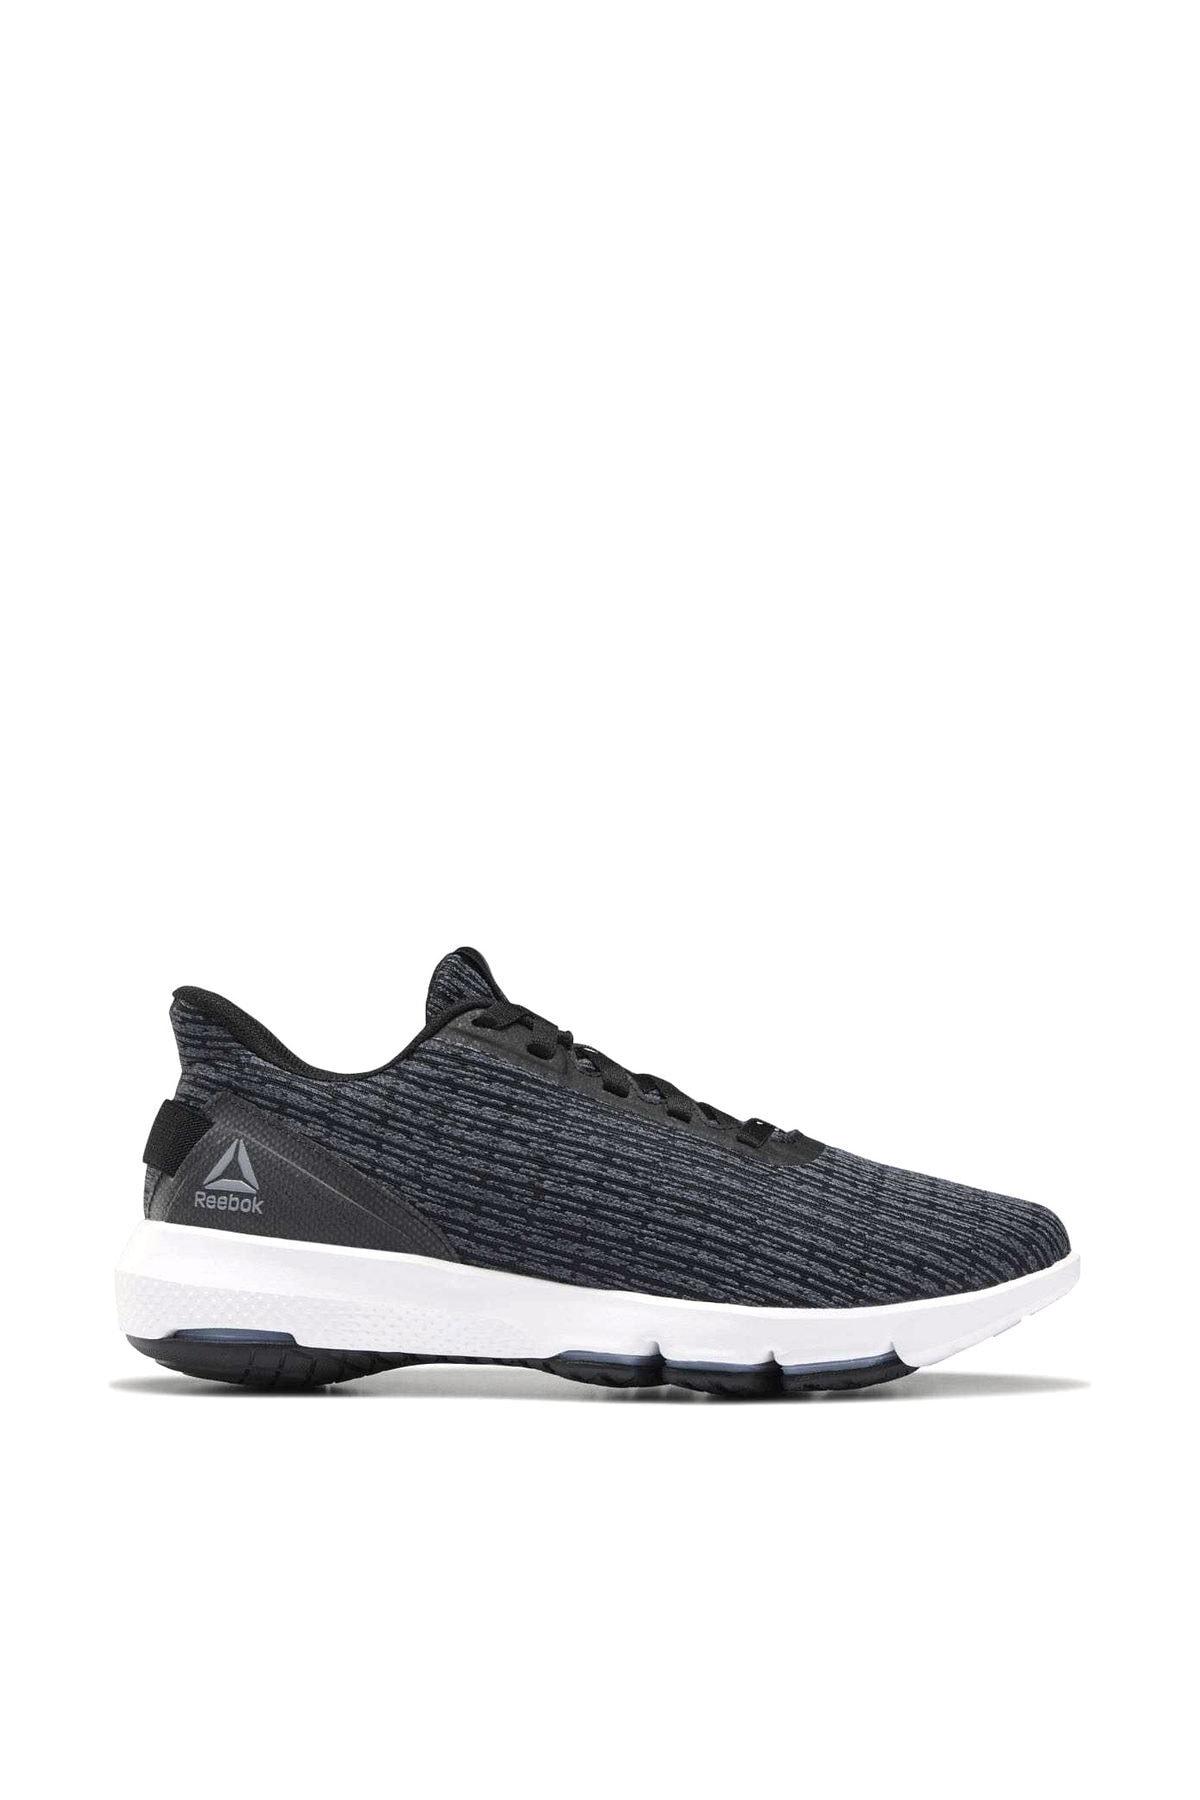 خرید اسان کفش کوهنوردی مردانه زیبا برند ریبوک رنگ مشکی کد ty38505494